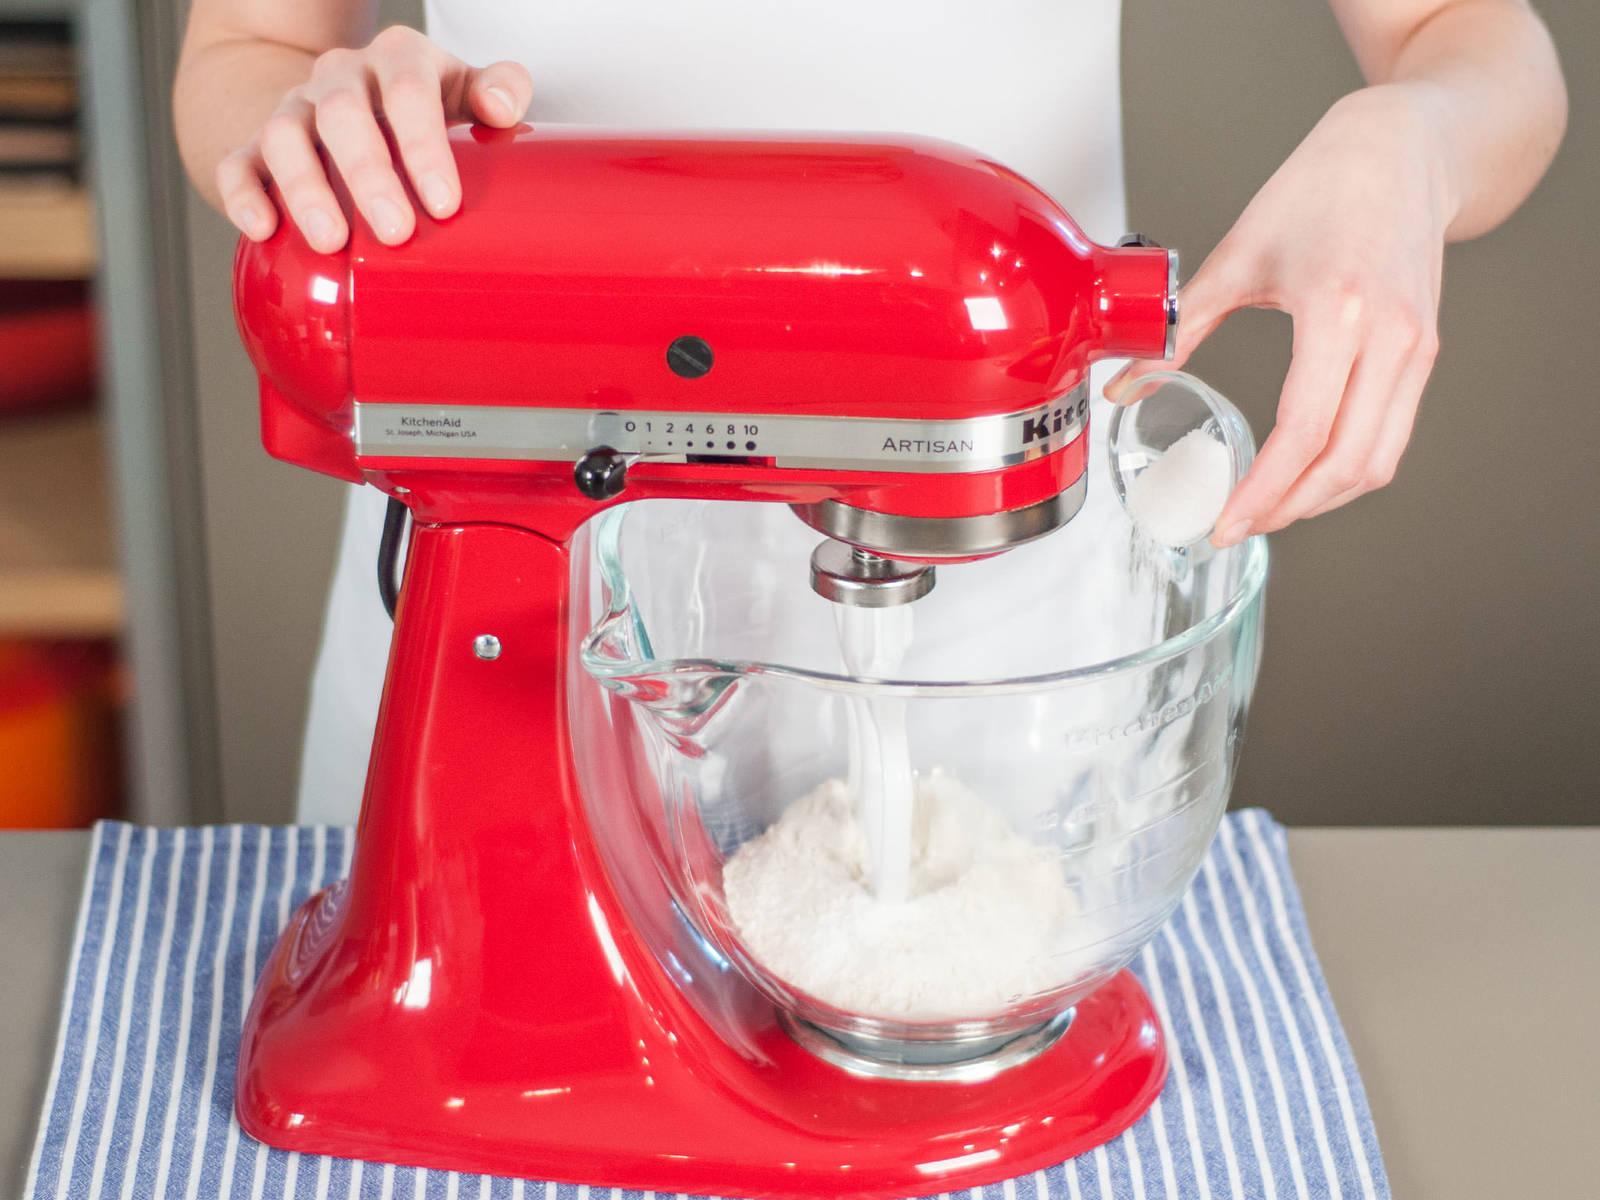 In a standing mixer, combine flour, baking powder, vanilla sugar, and a pinch of salt.